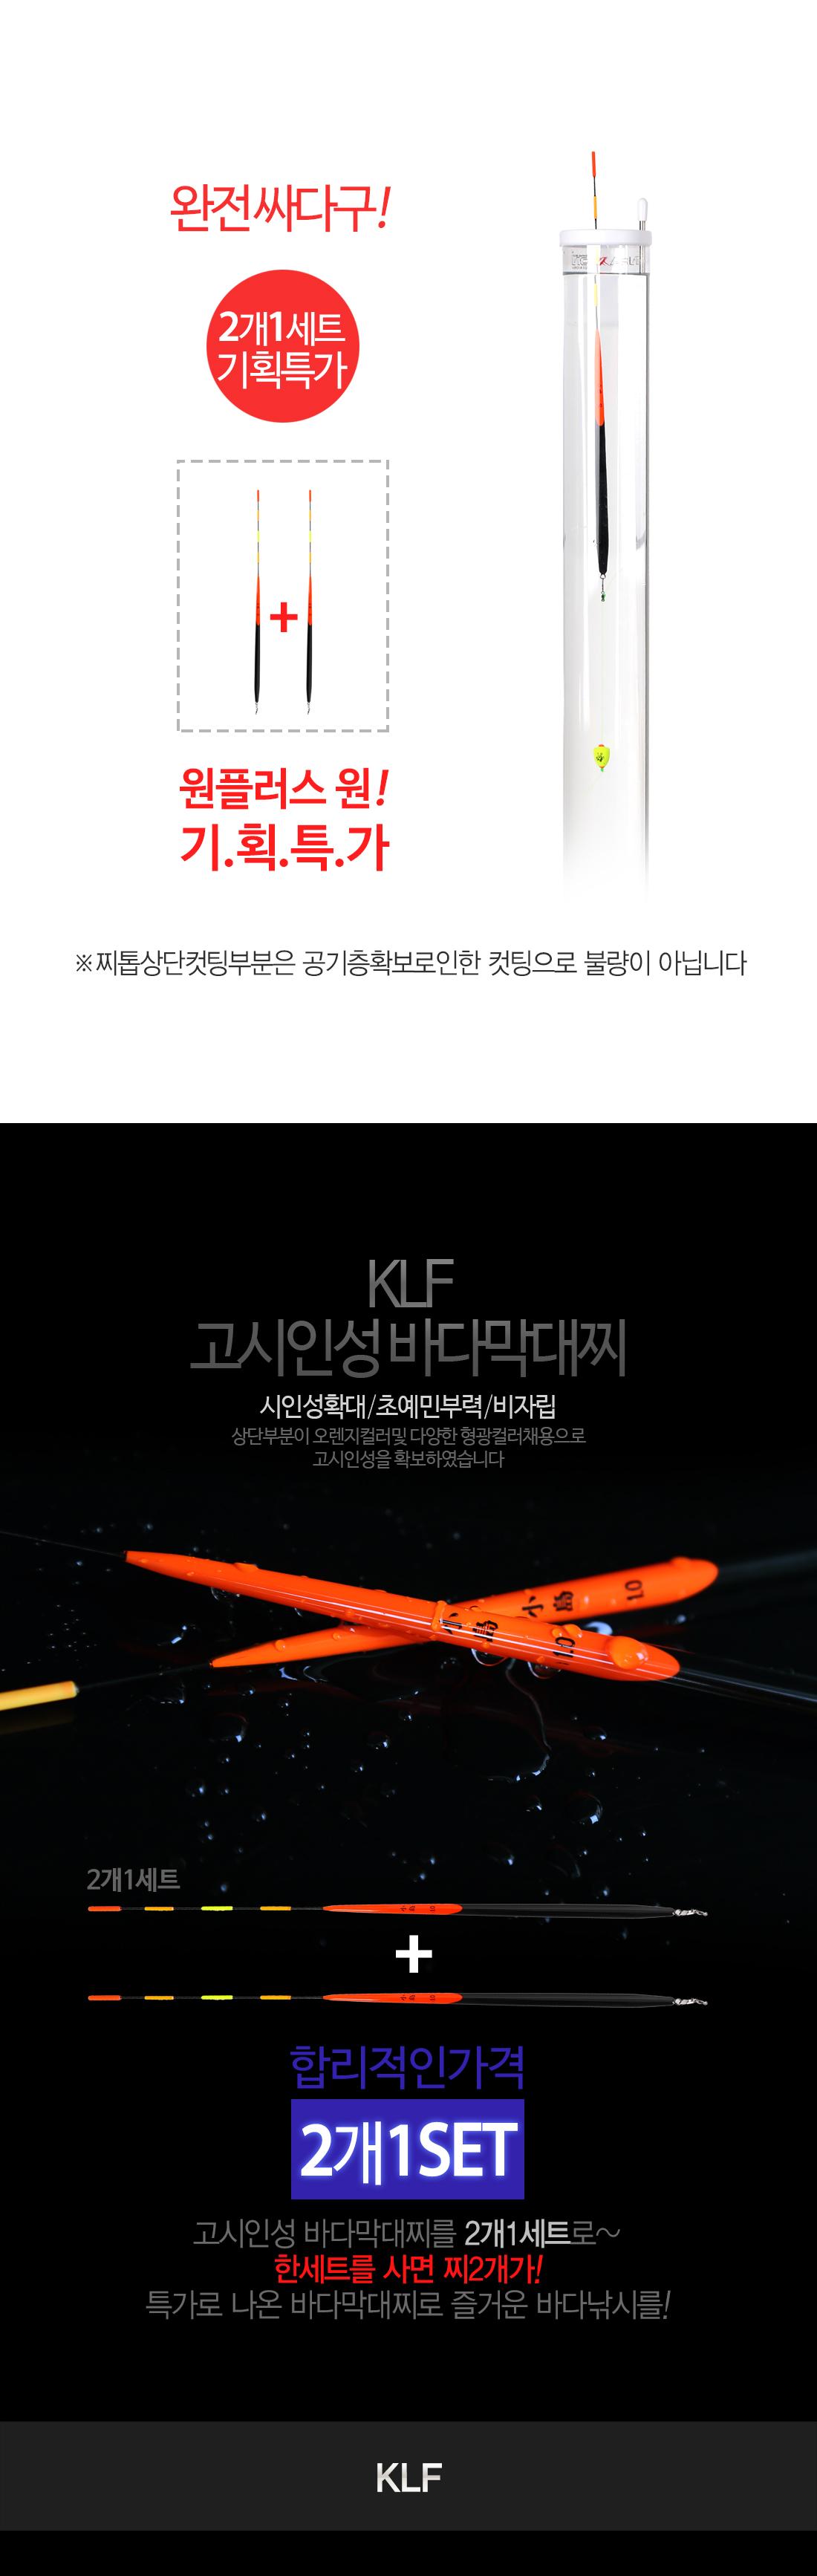 KLF 고시인성 바다막대찌 [1+1 기획특가] [비자립] 바다막대찌 비자립막대찌 발포찌톱막대찌 비자립